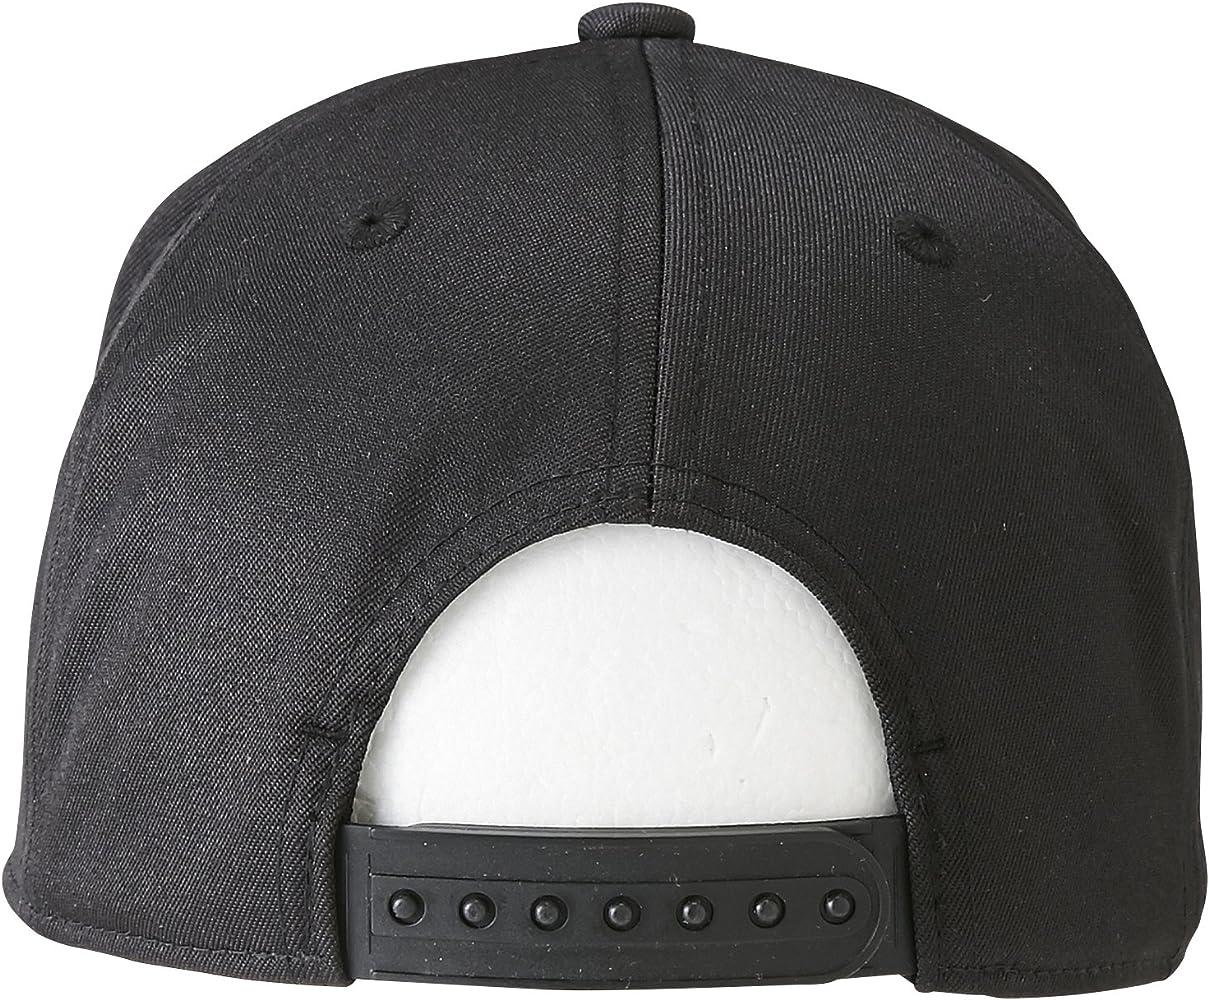 Adidas Flat Cap - Gorra Unisex, Color Negro/Blanco, Talla OSFM ...